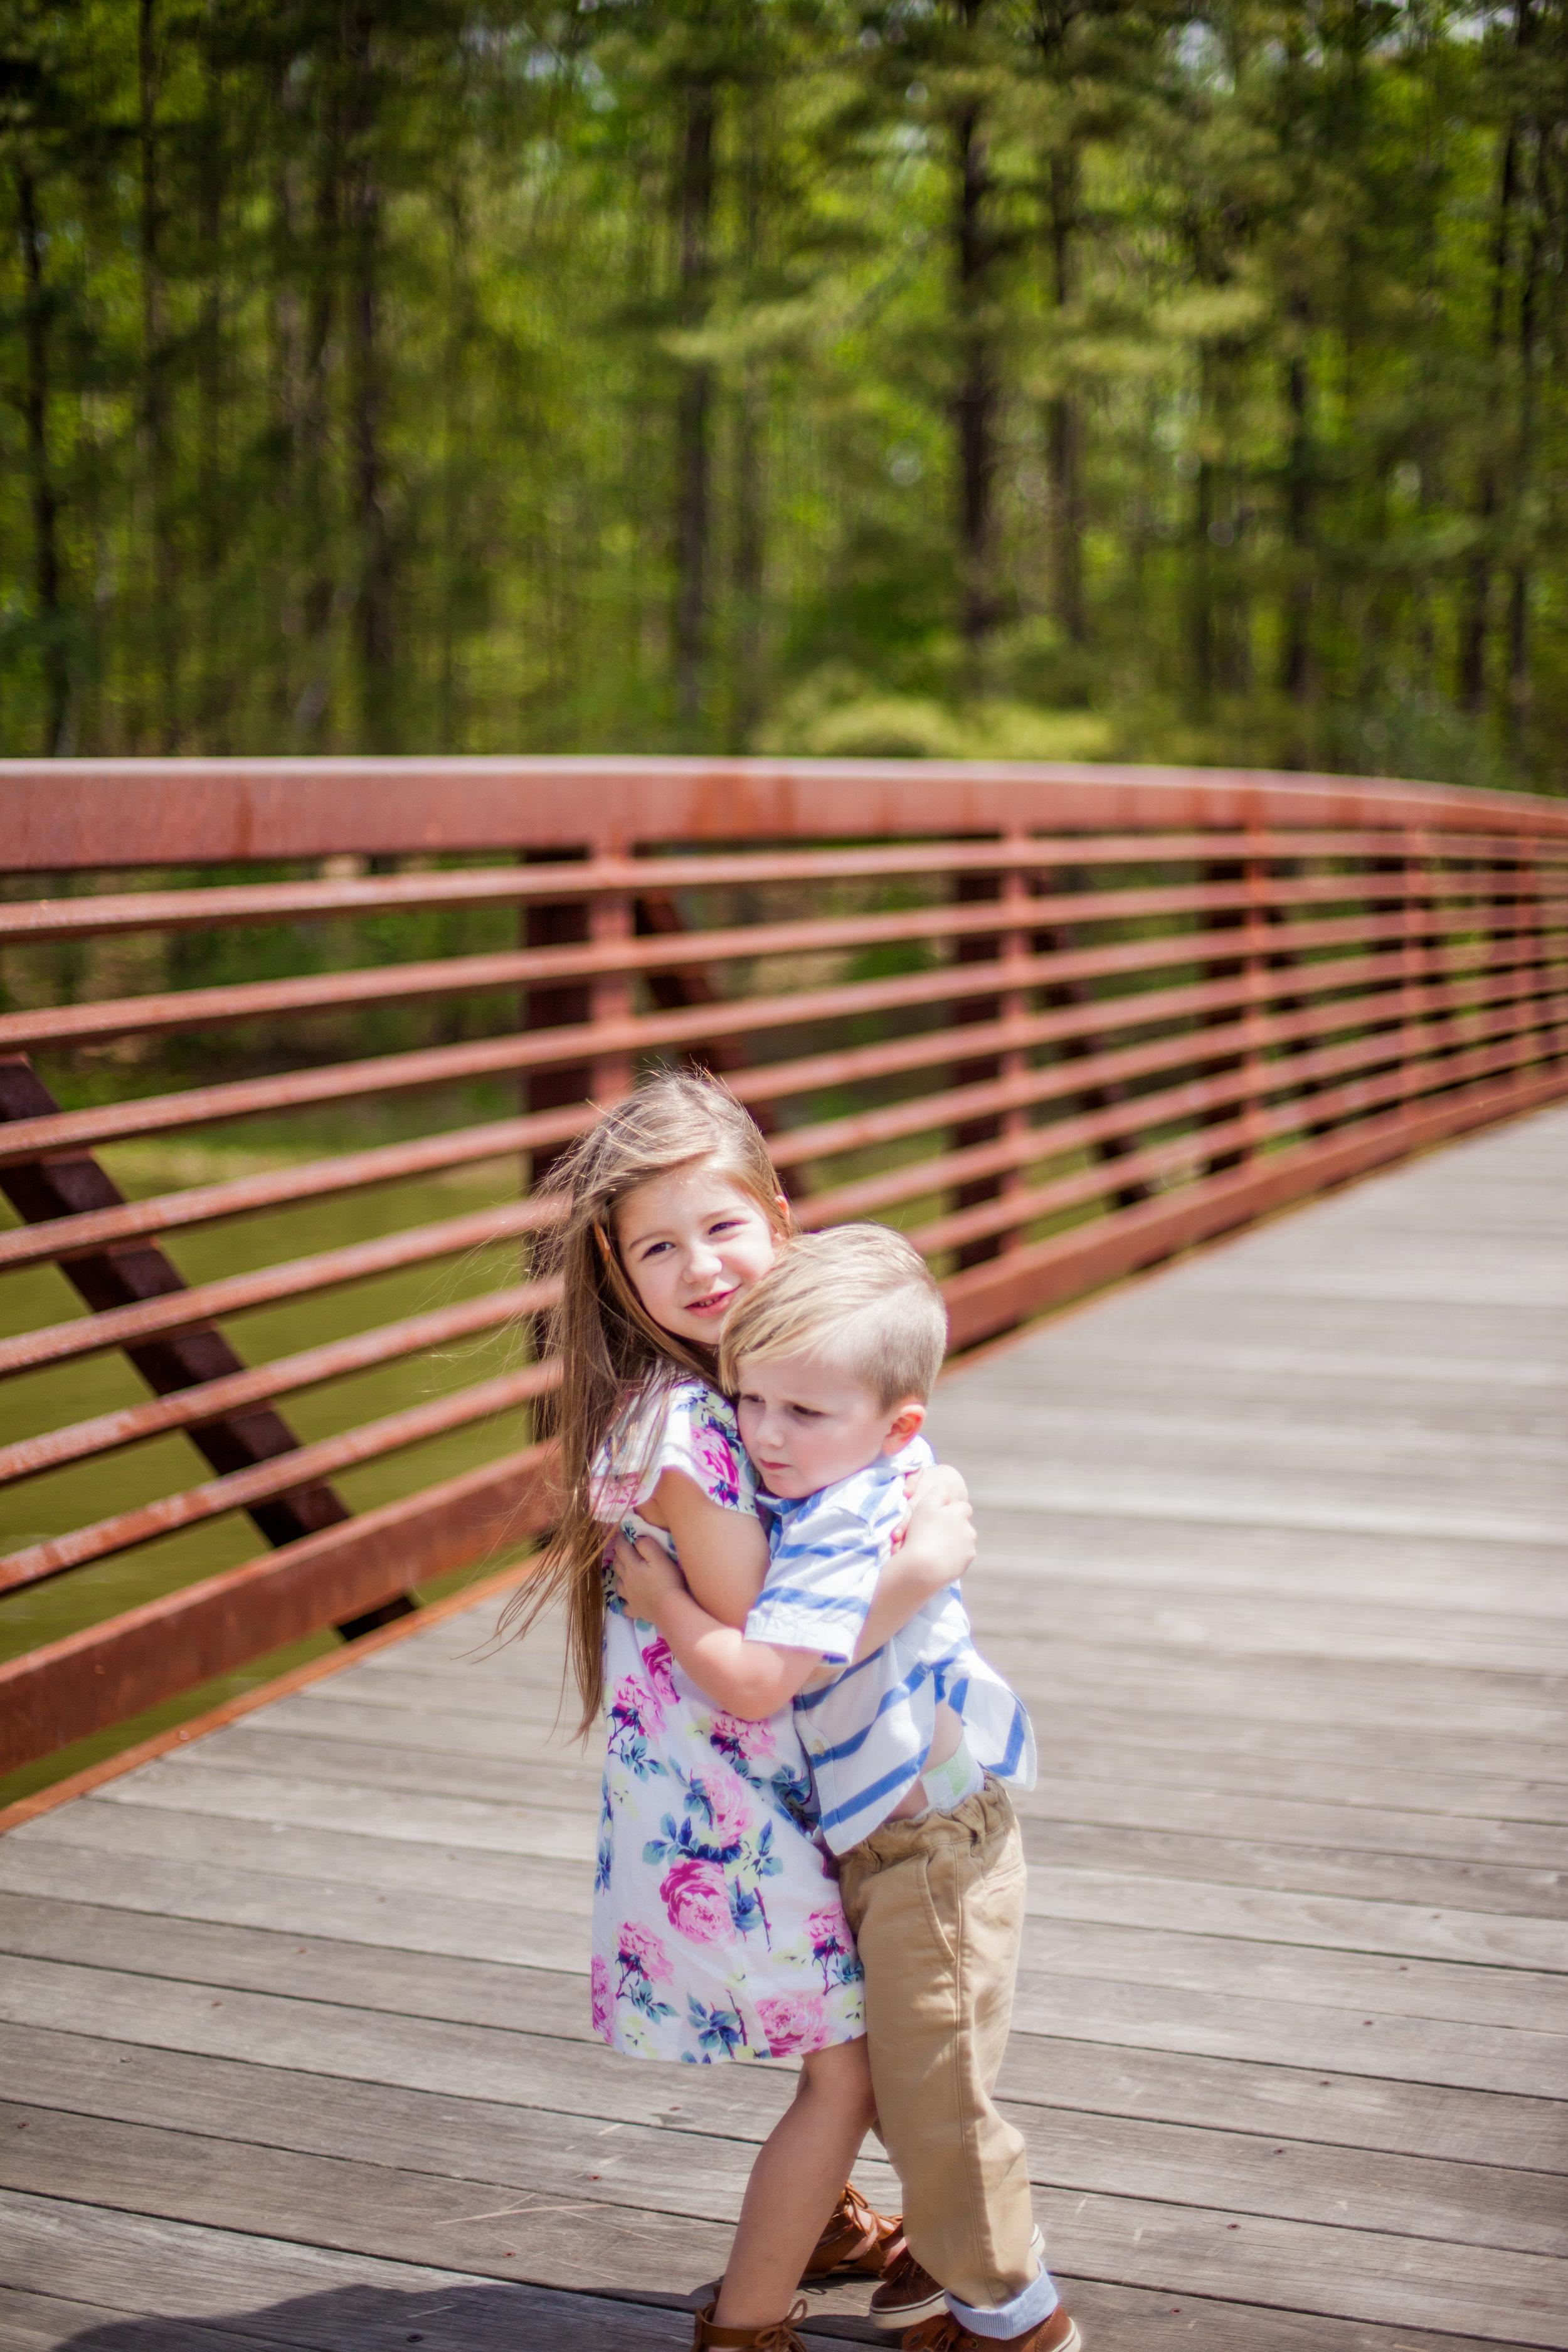 woodstock-family-photography-mini-session-acworth-beach-59.jpg